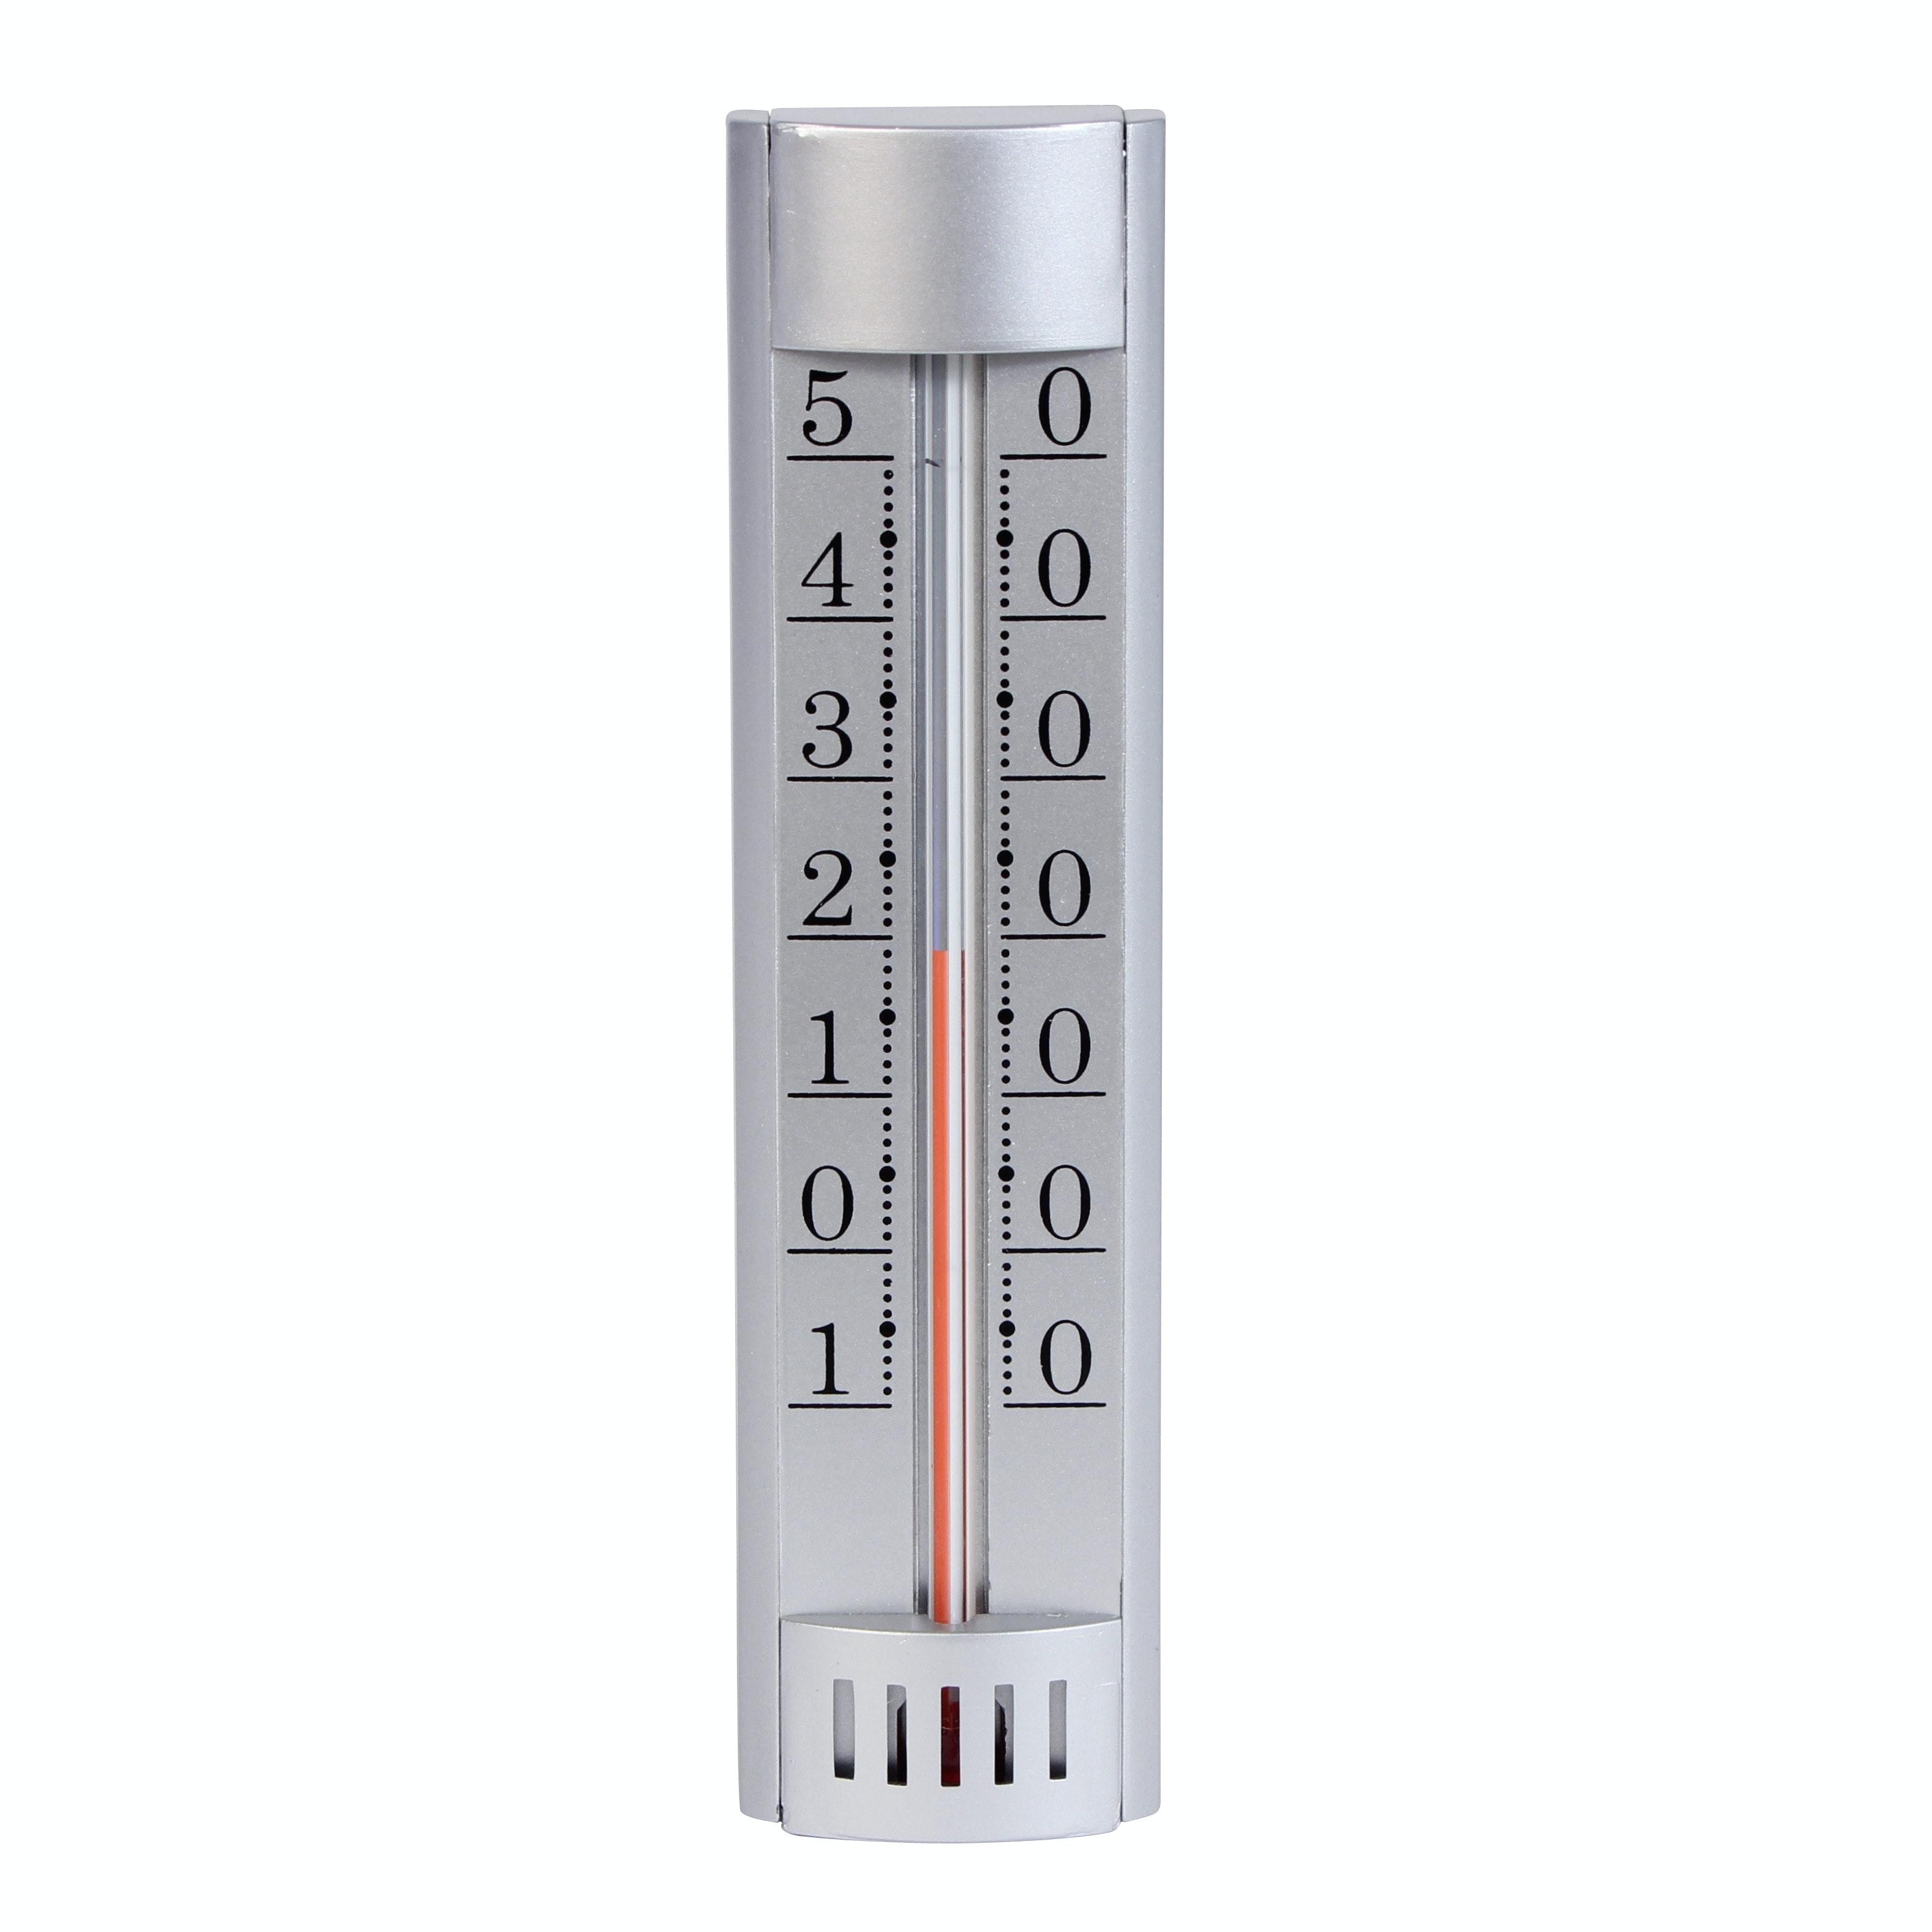 termometer Cofa Inne Grå 160mm